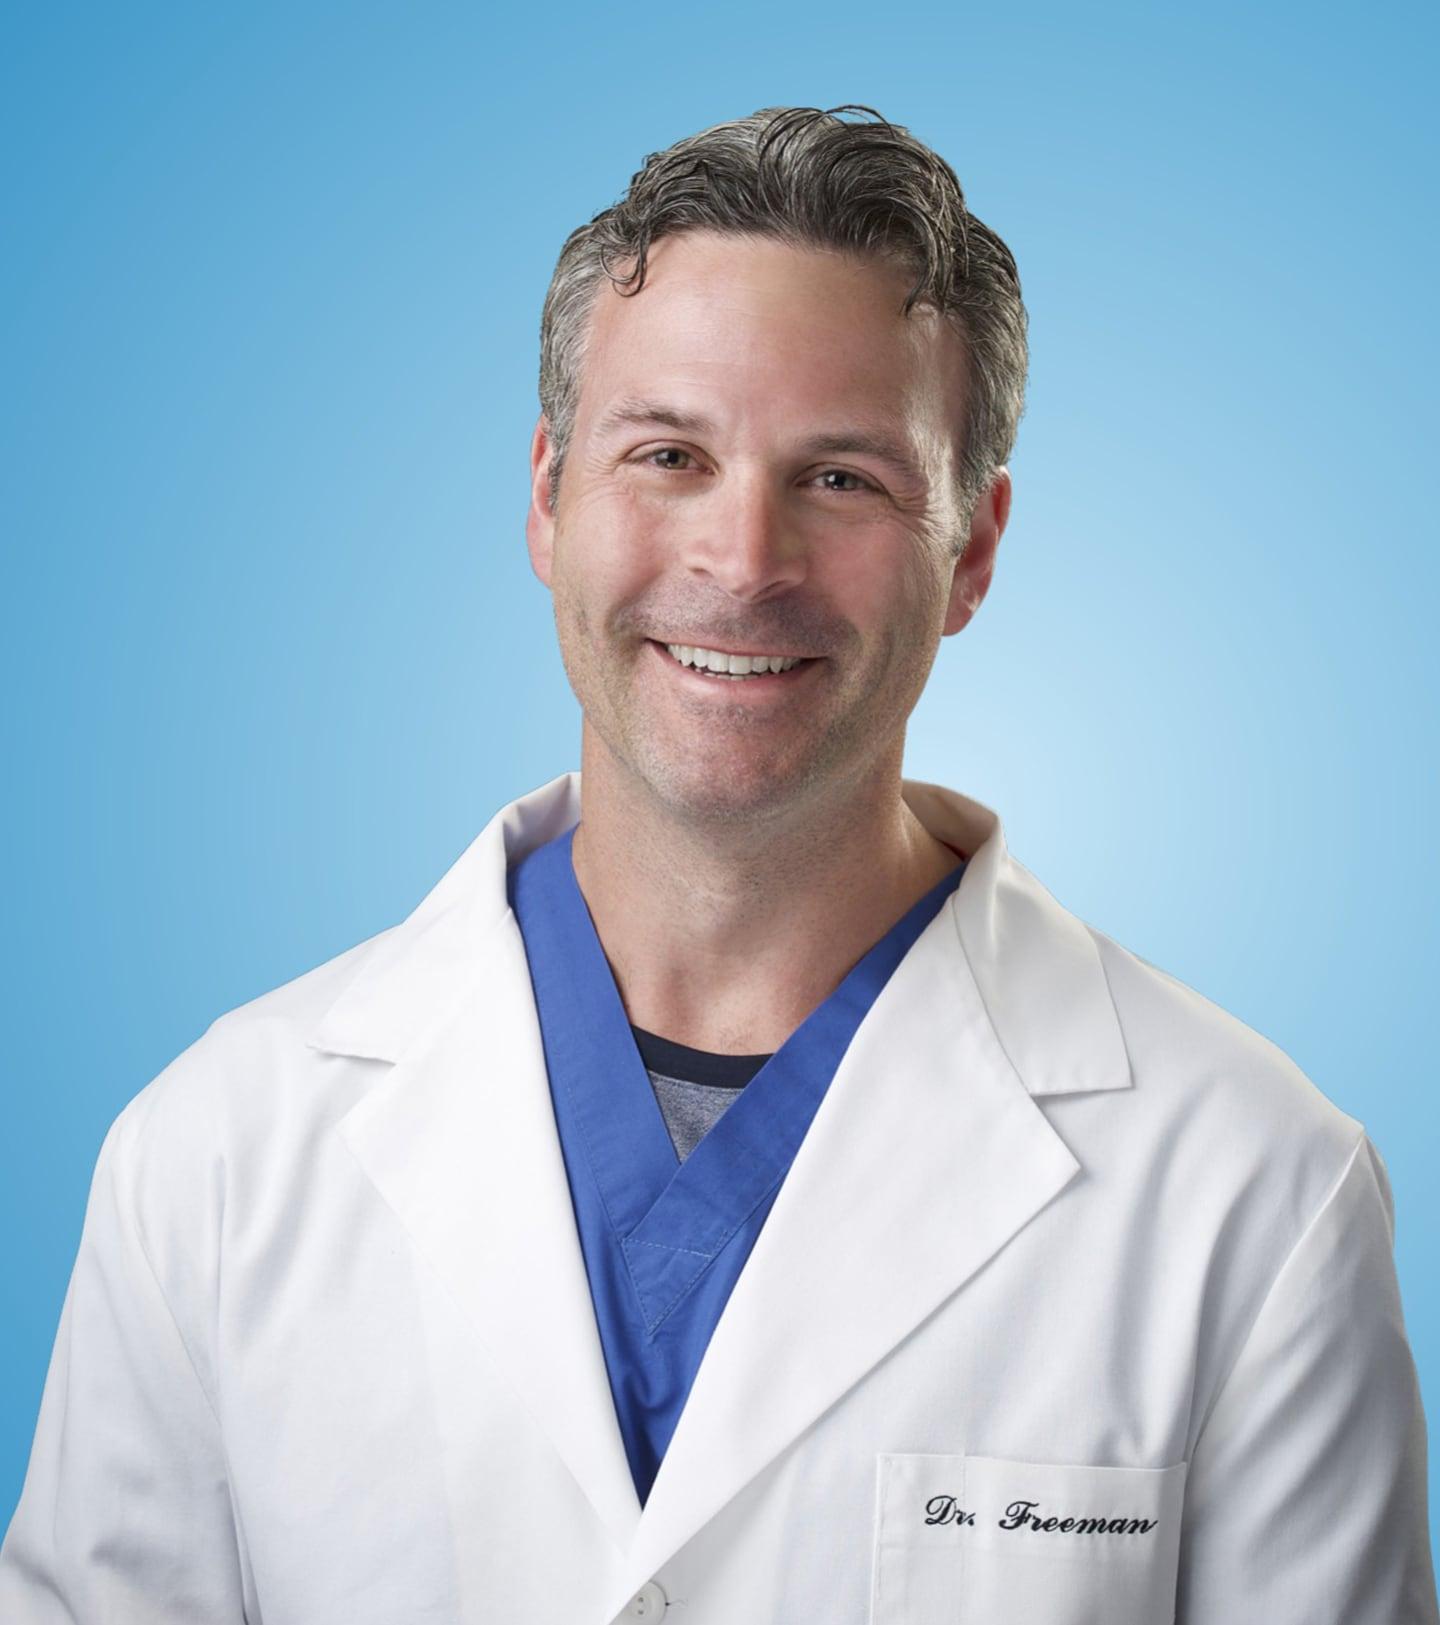 Eric Freeman Redefine Healthcare